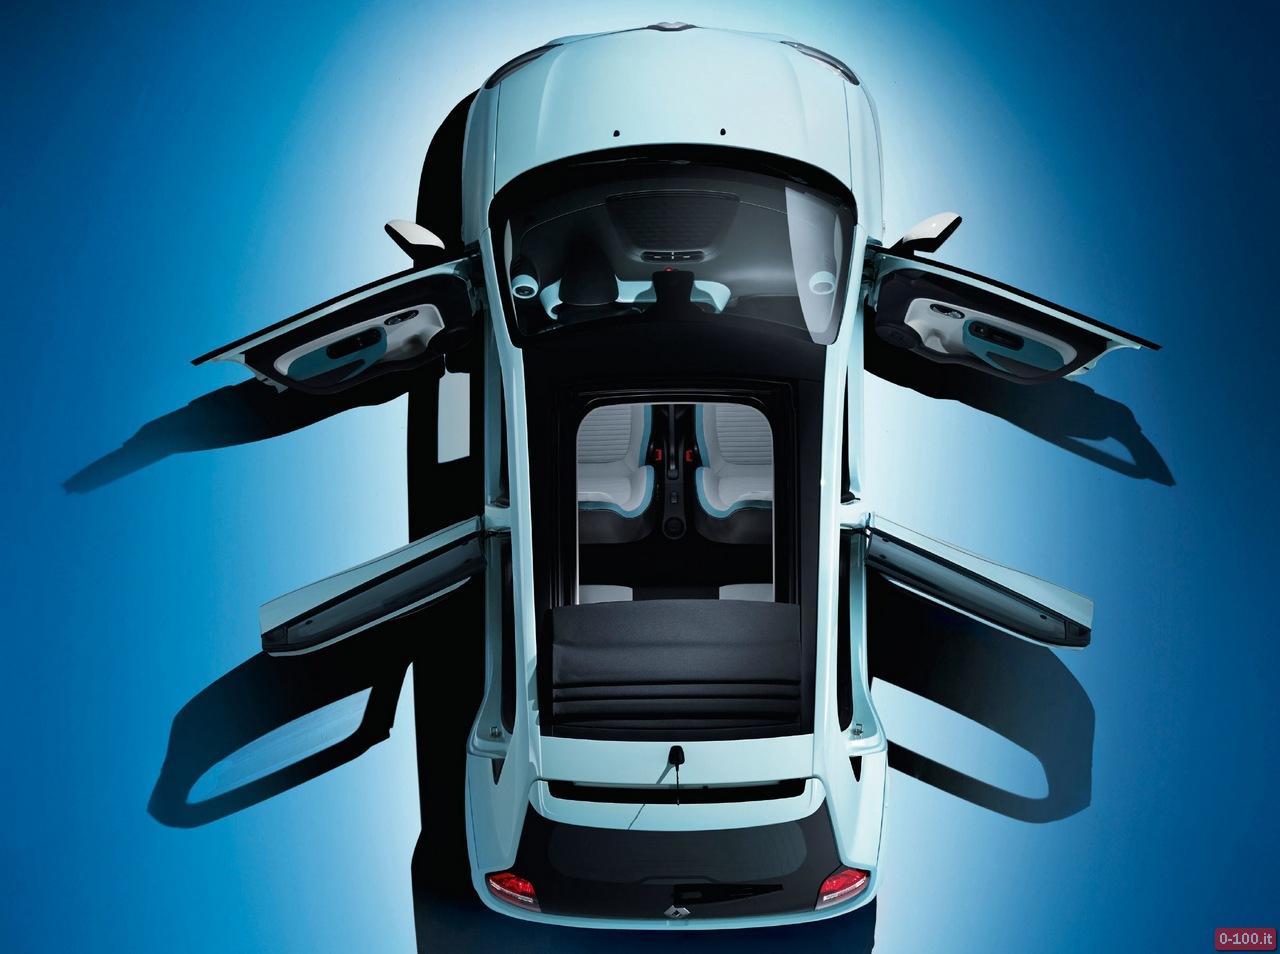 geneve-2014-renault-twingo-motore-posteriore-prezzo-0-100_4